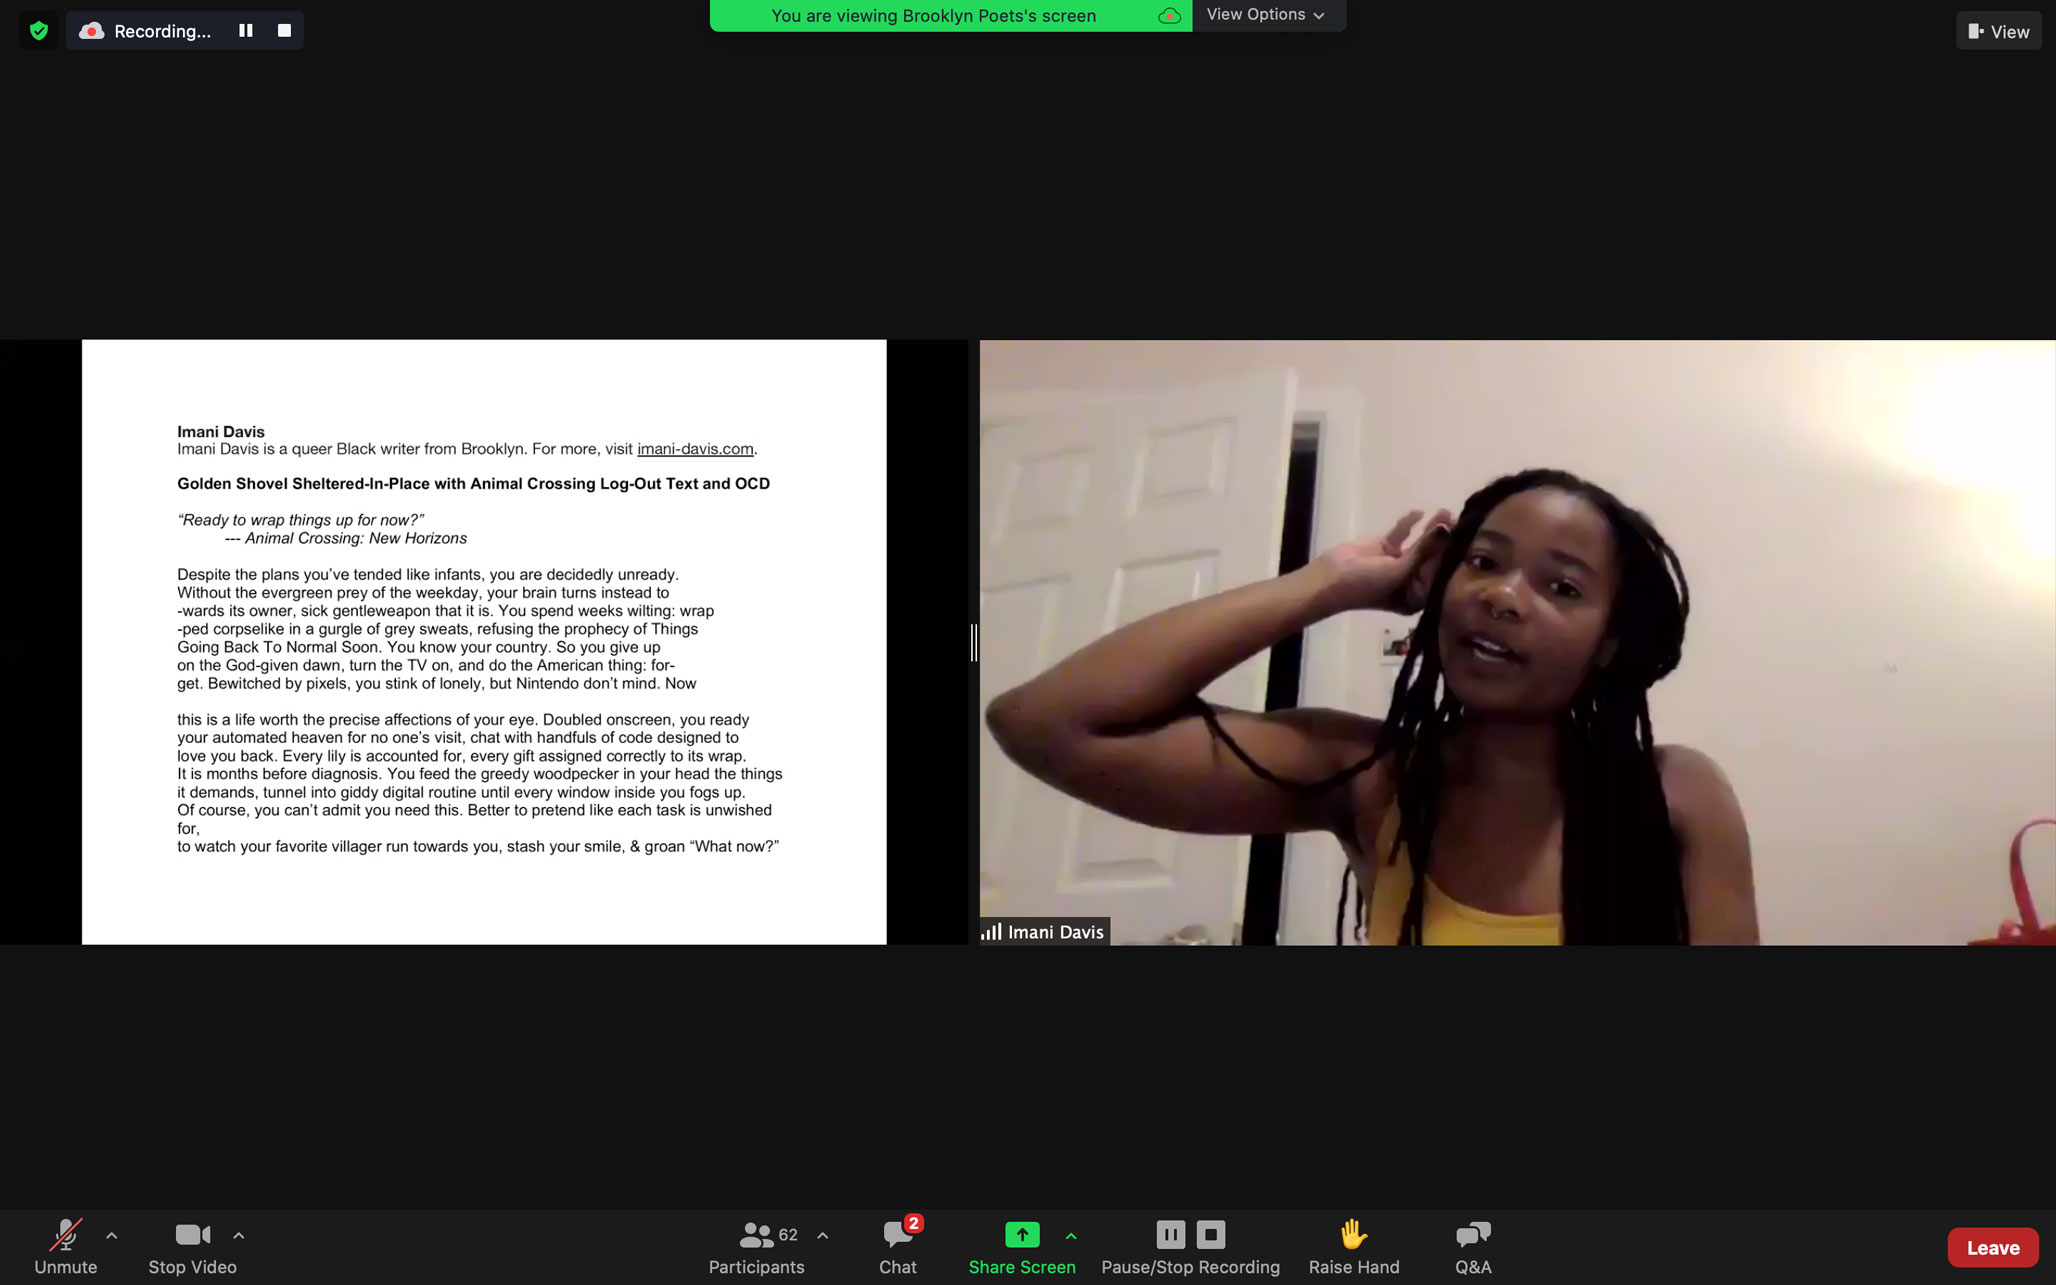 Imani Davis reads at Brooklyn Poets Workshop Showcase